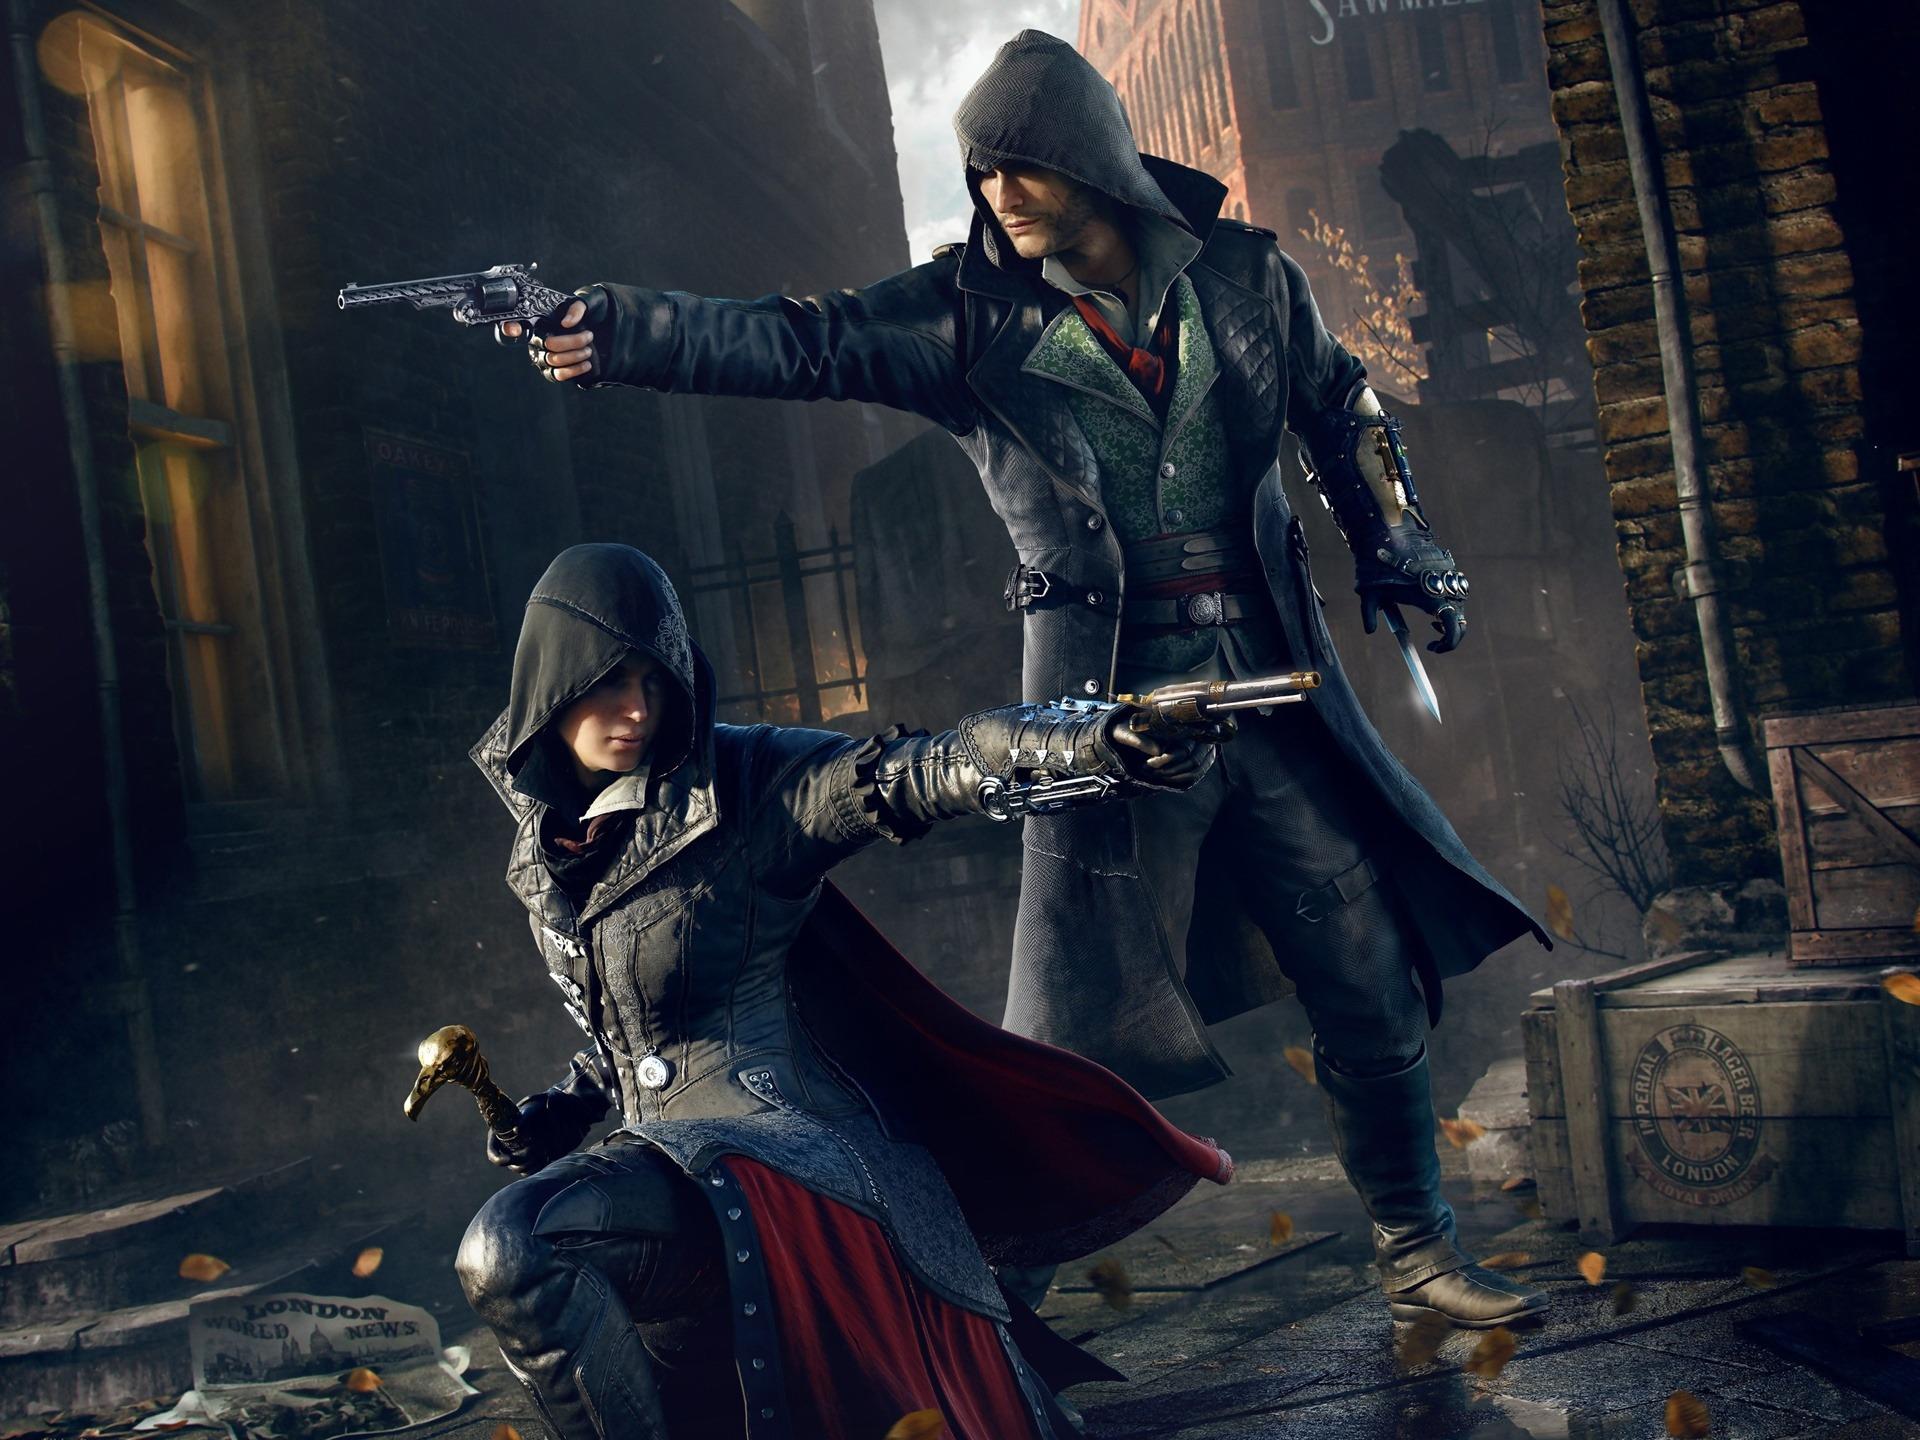 Assassins Creed Arno Dorian Pc Game Hd Wallpaper Preview 10wallpaper Com